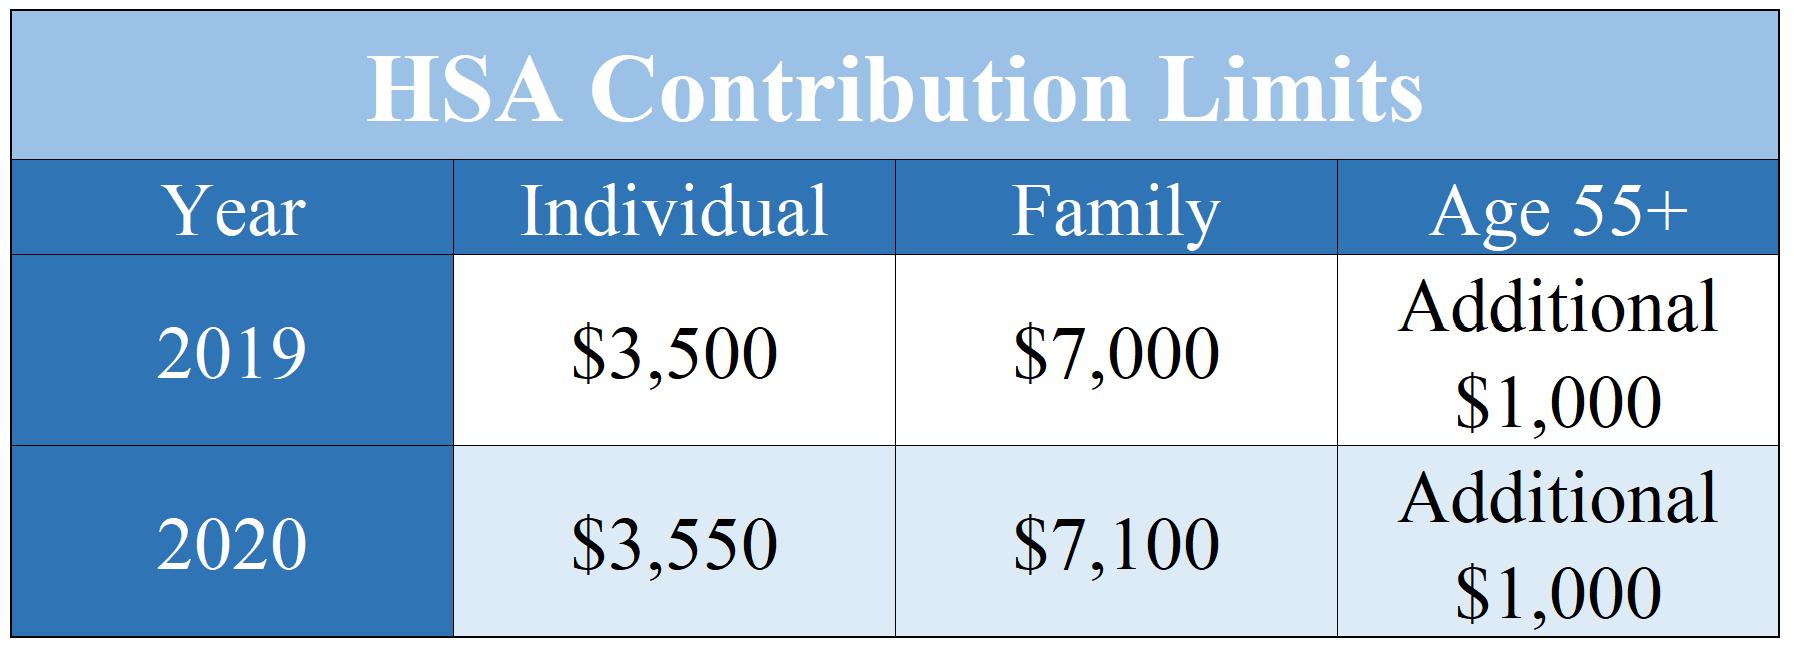 HSA contribution limits 2020